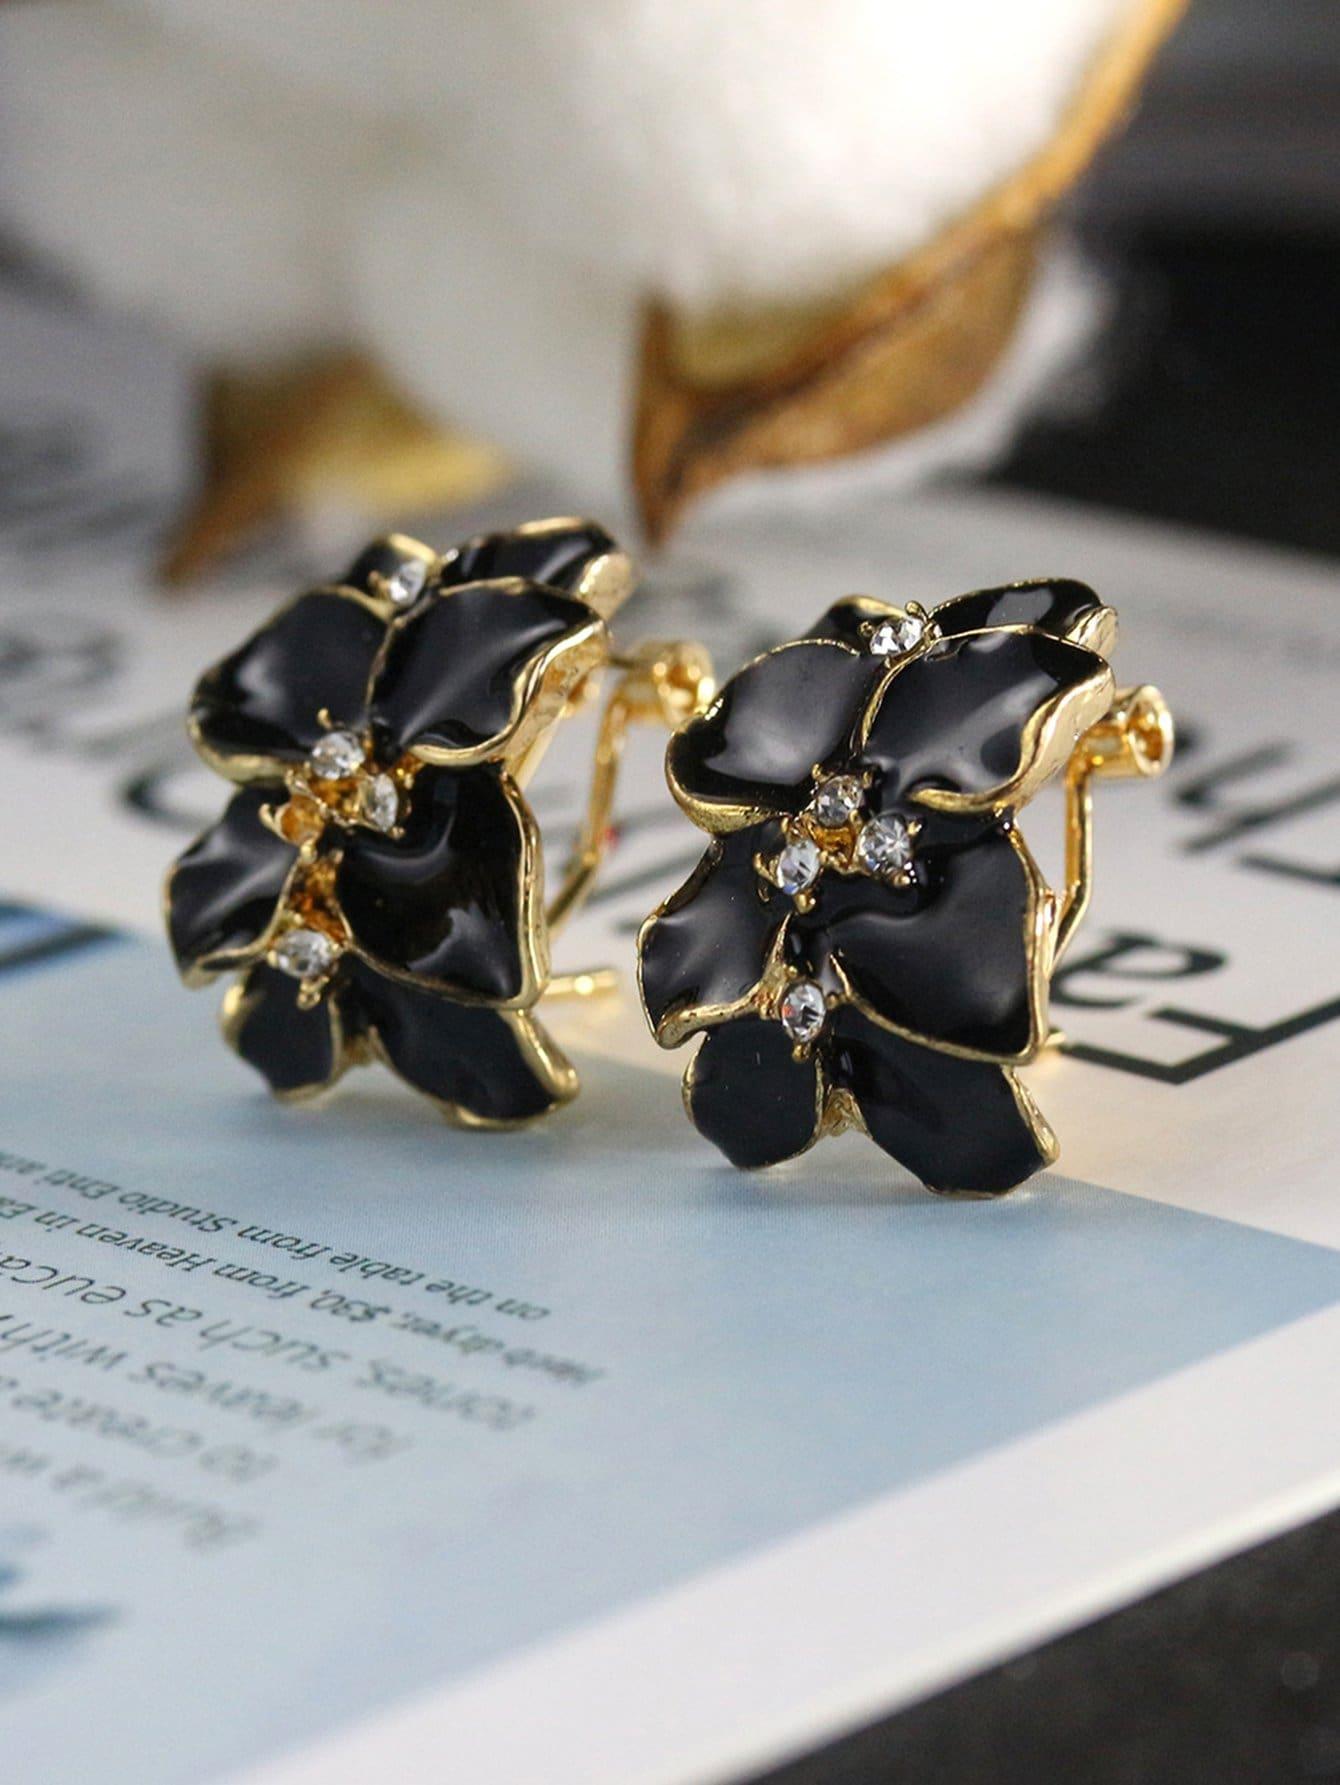 Clip On Flower Earrings clip on earrings with mandala flower pattern round pendant